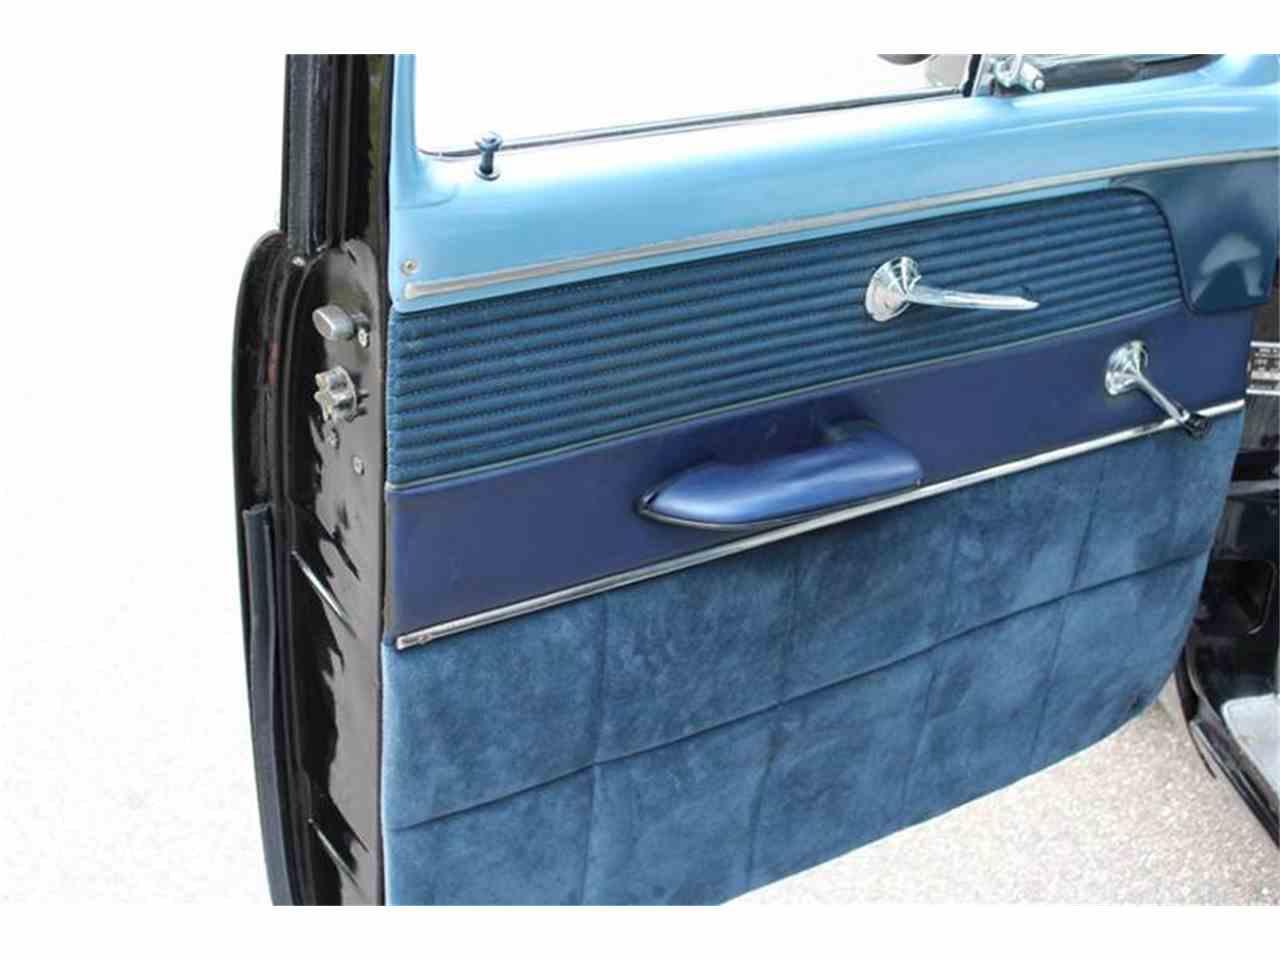 Large Picture of '54 Ford Crestline - $18,900.00 - HMCE